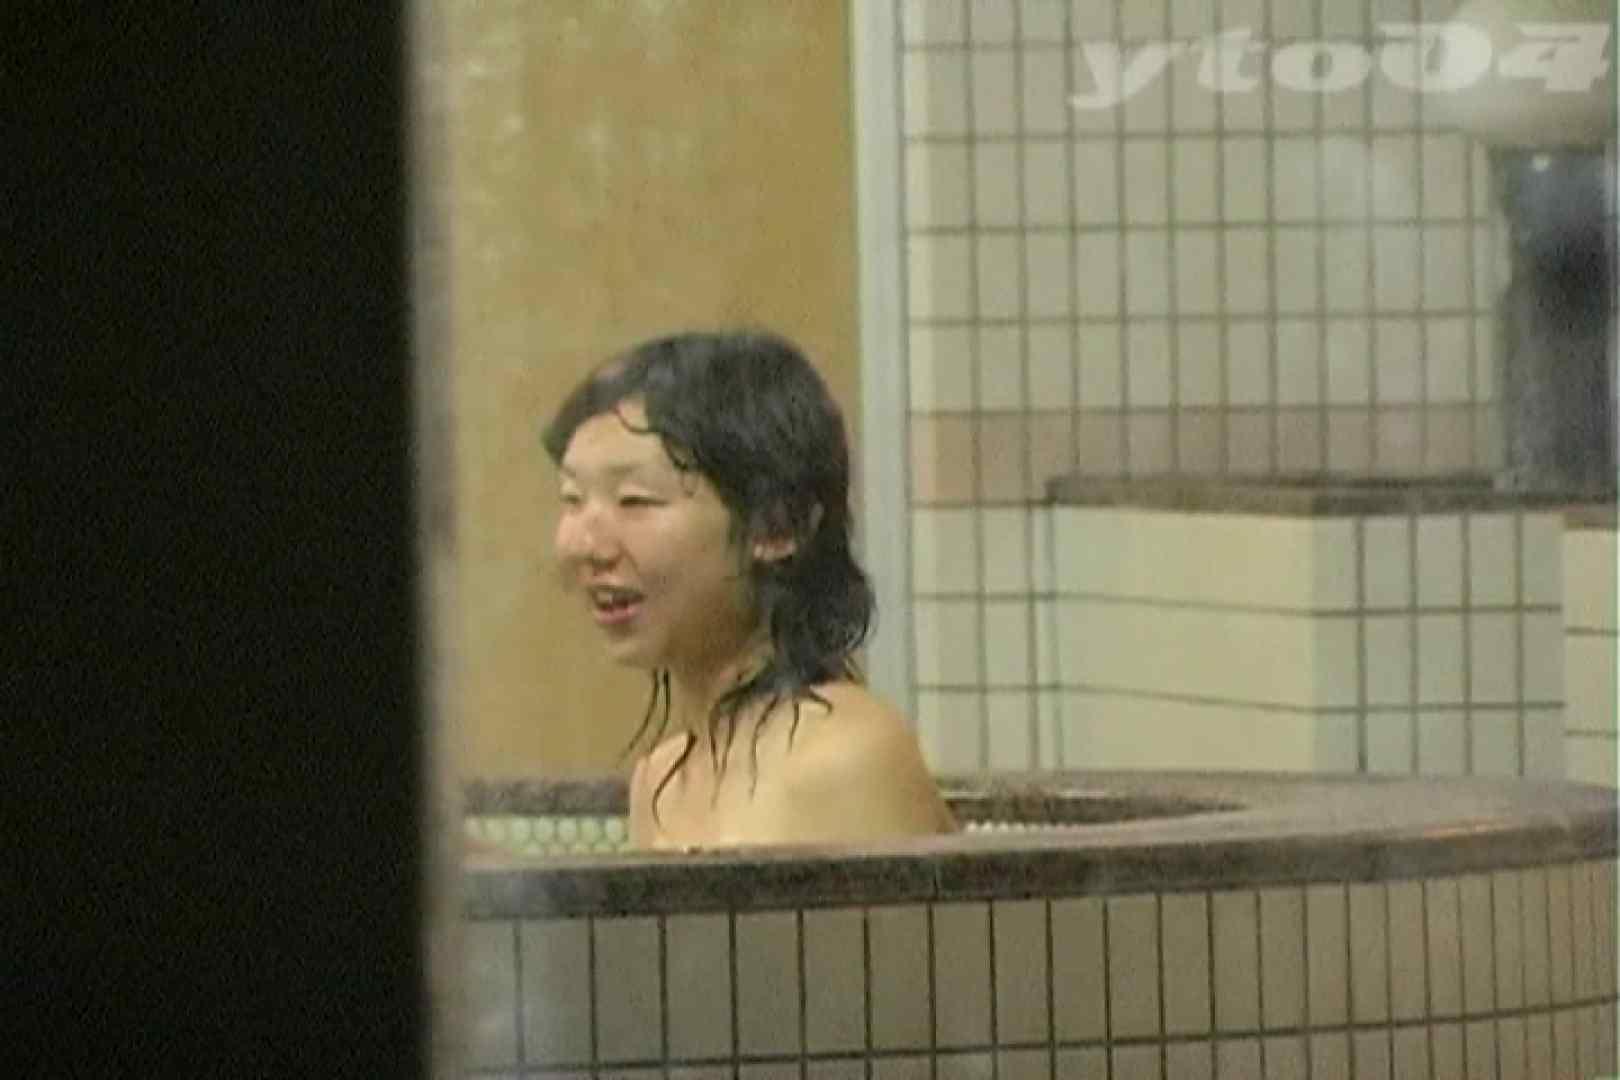 ▲復活限定▲合宿ホテル女風呂盗撮 Vol.24 名作  55pic 19